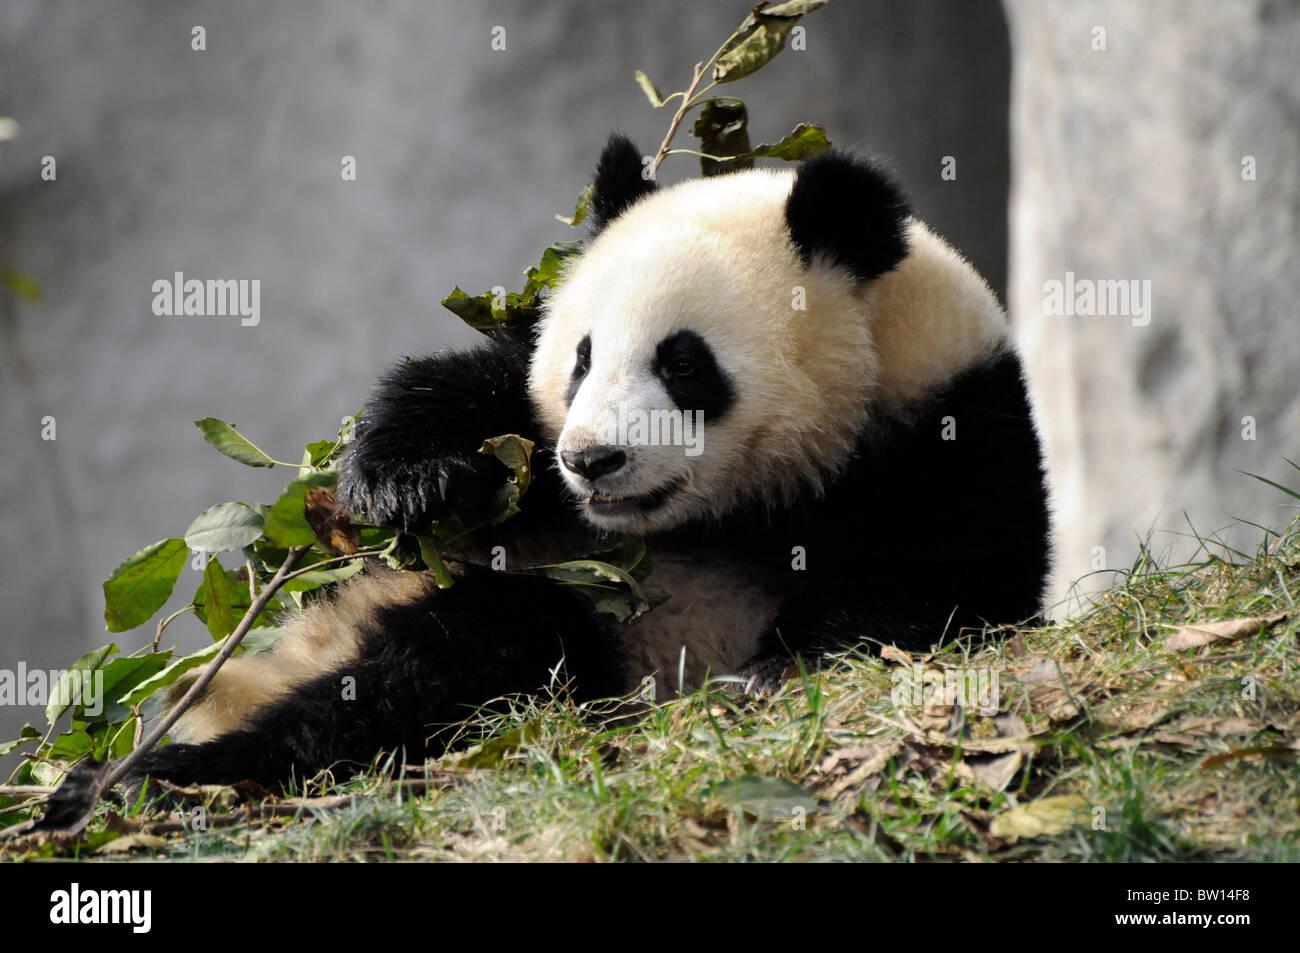 Giant Panda (Ailuropoda melanoleuca) sitting, Chengdu Panda Breeding Reserve, Sichuan province, China - Stock Image